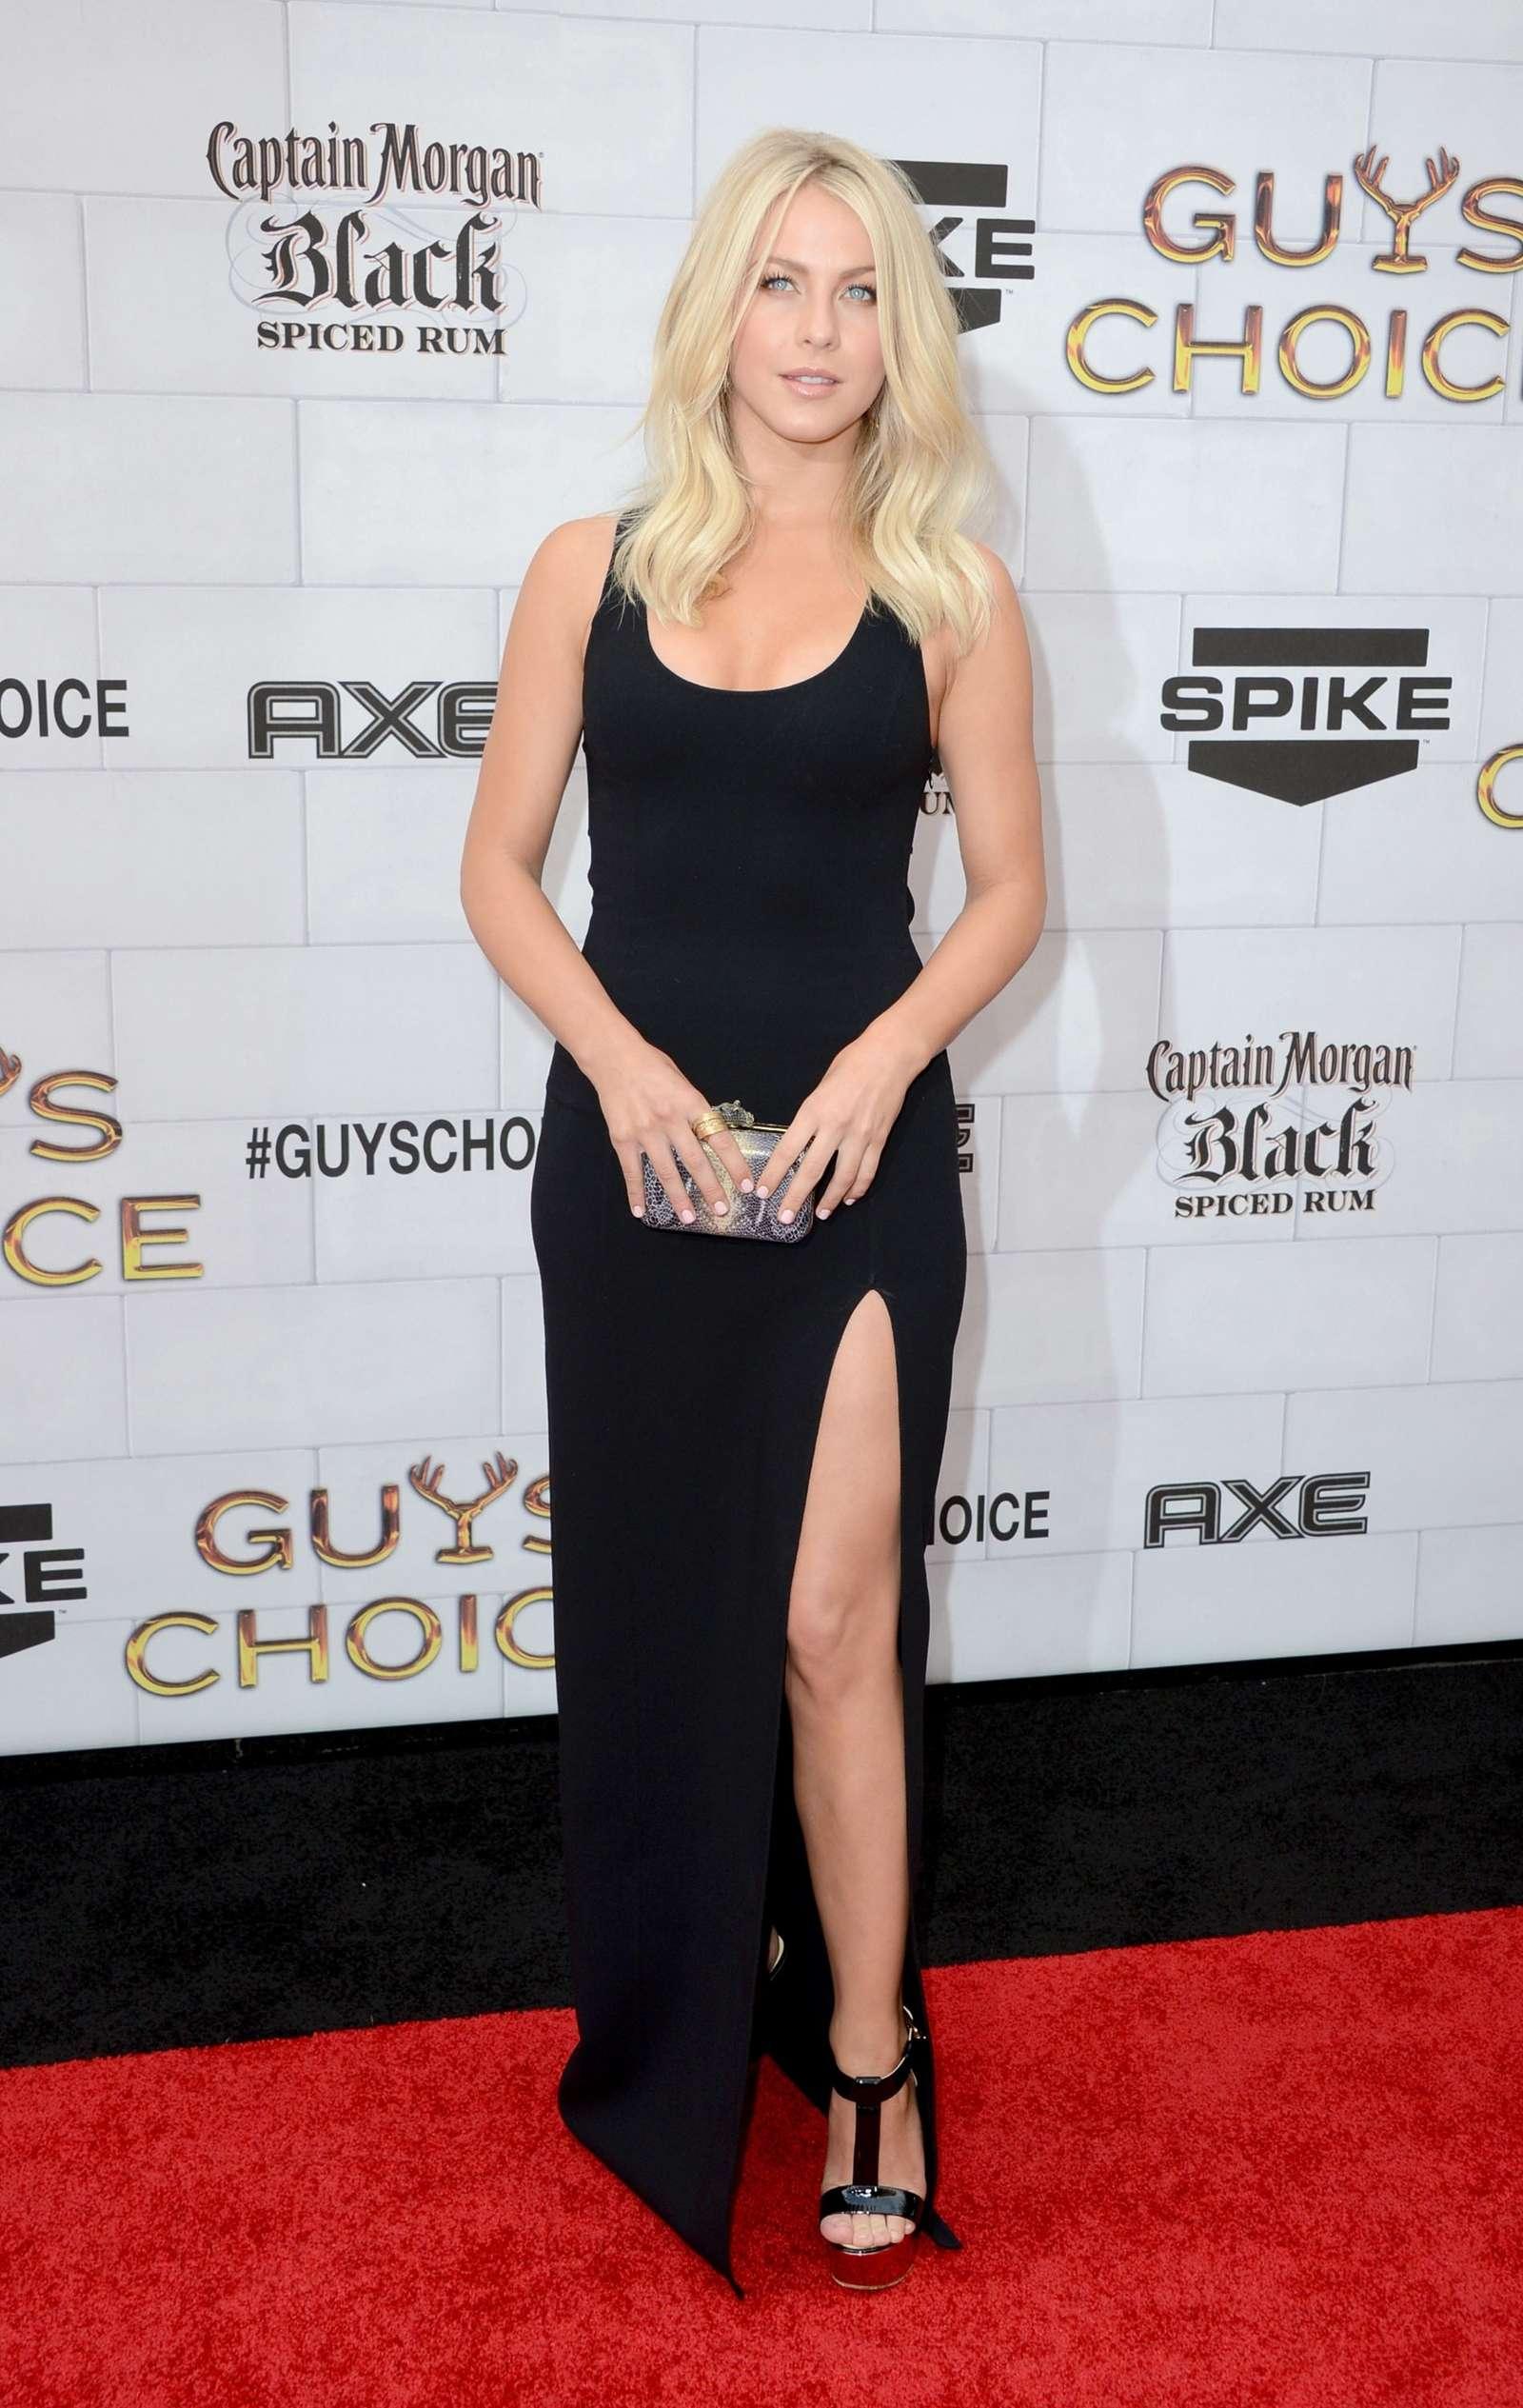 Julianne Hough Hot In Dress At 2012 Spike Guys Choice